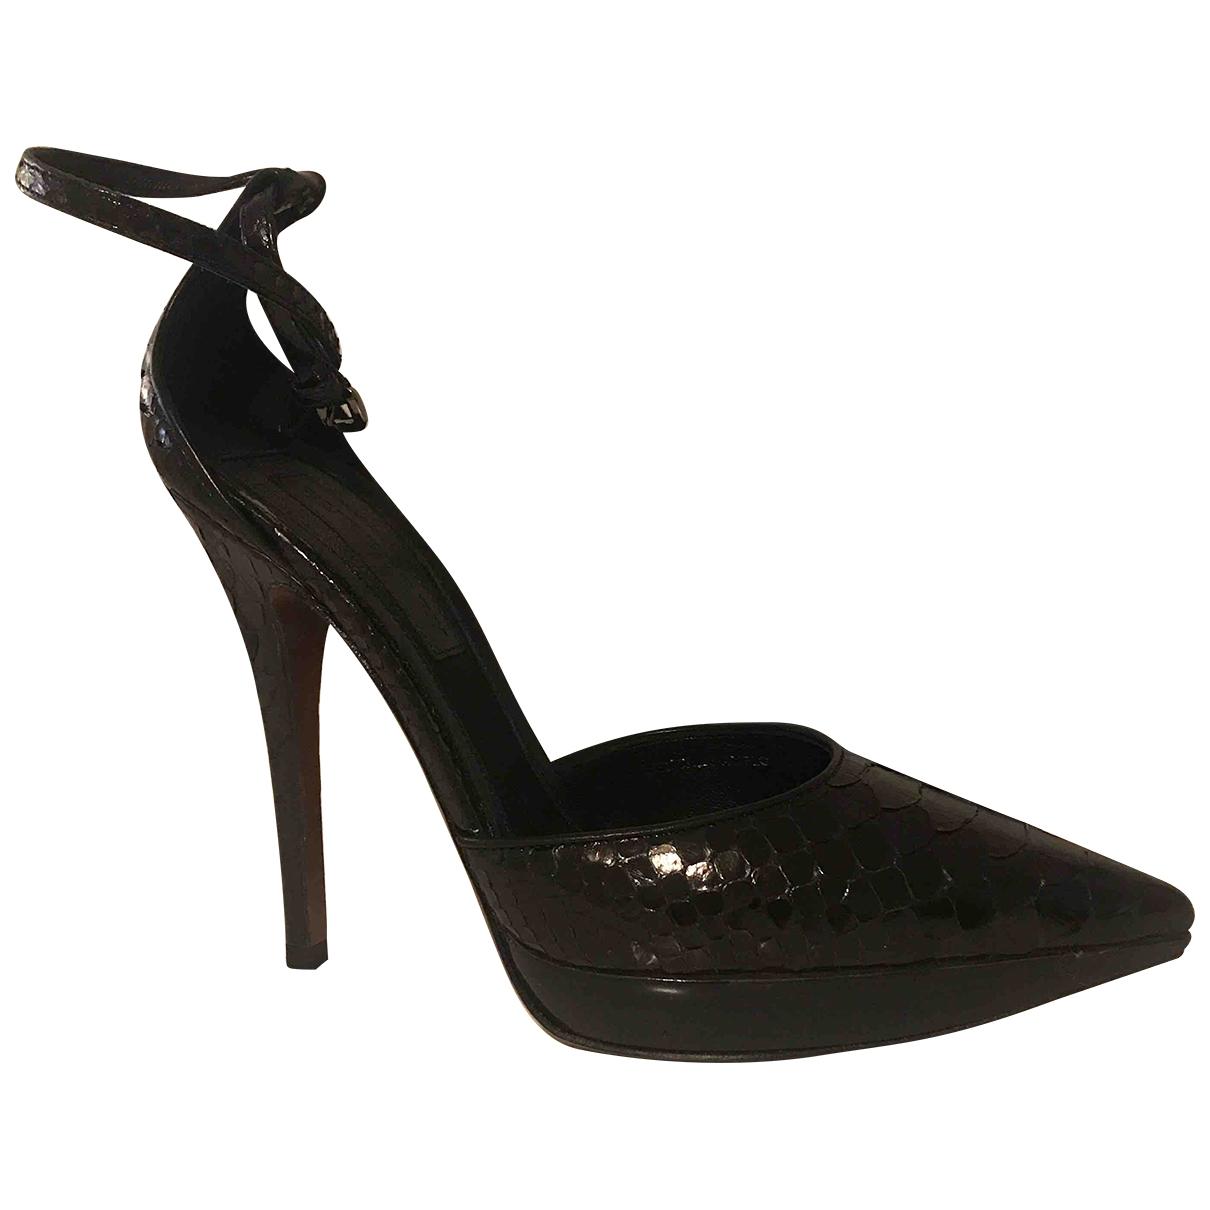 Burberry \N Black Leather Heels for Women 39 EU